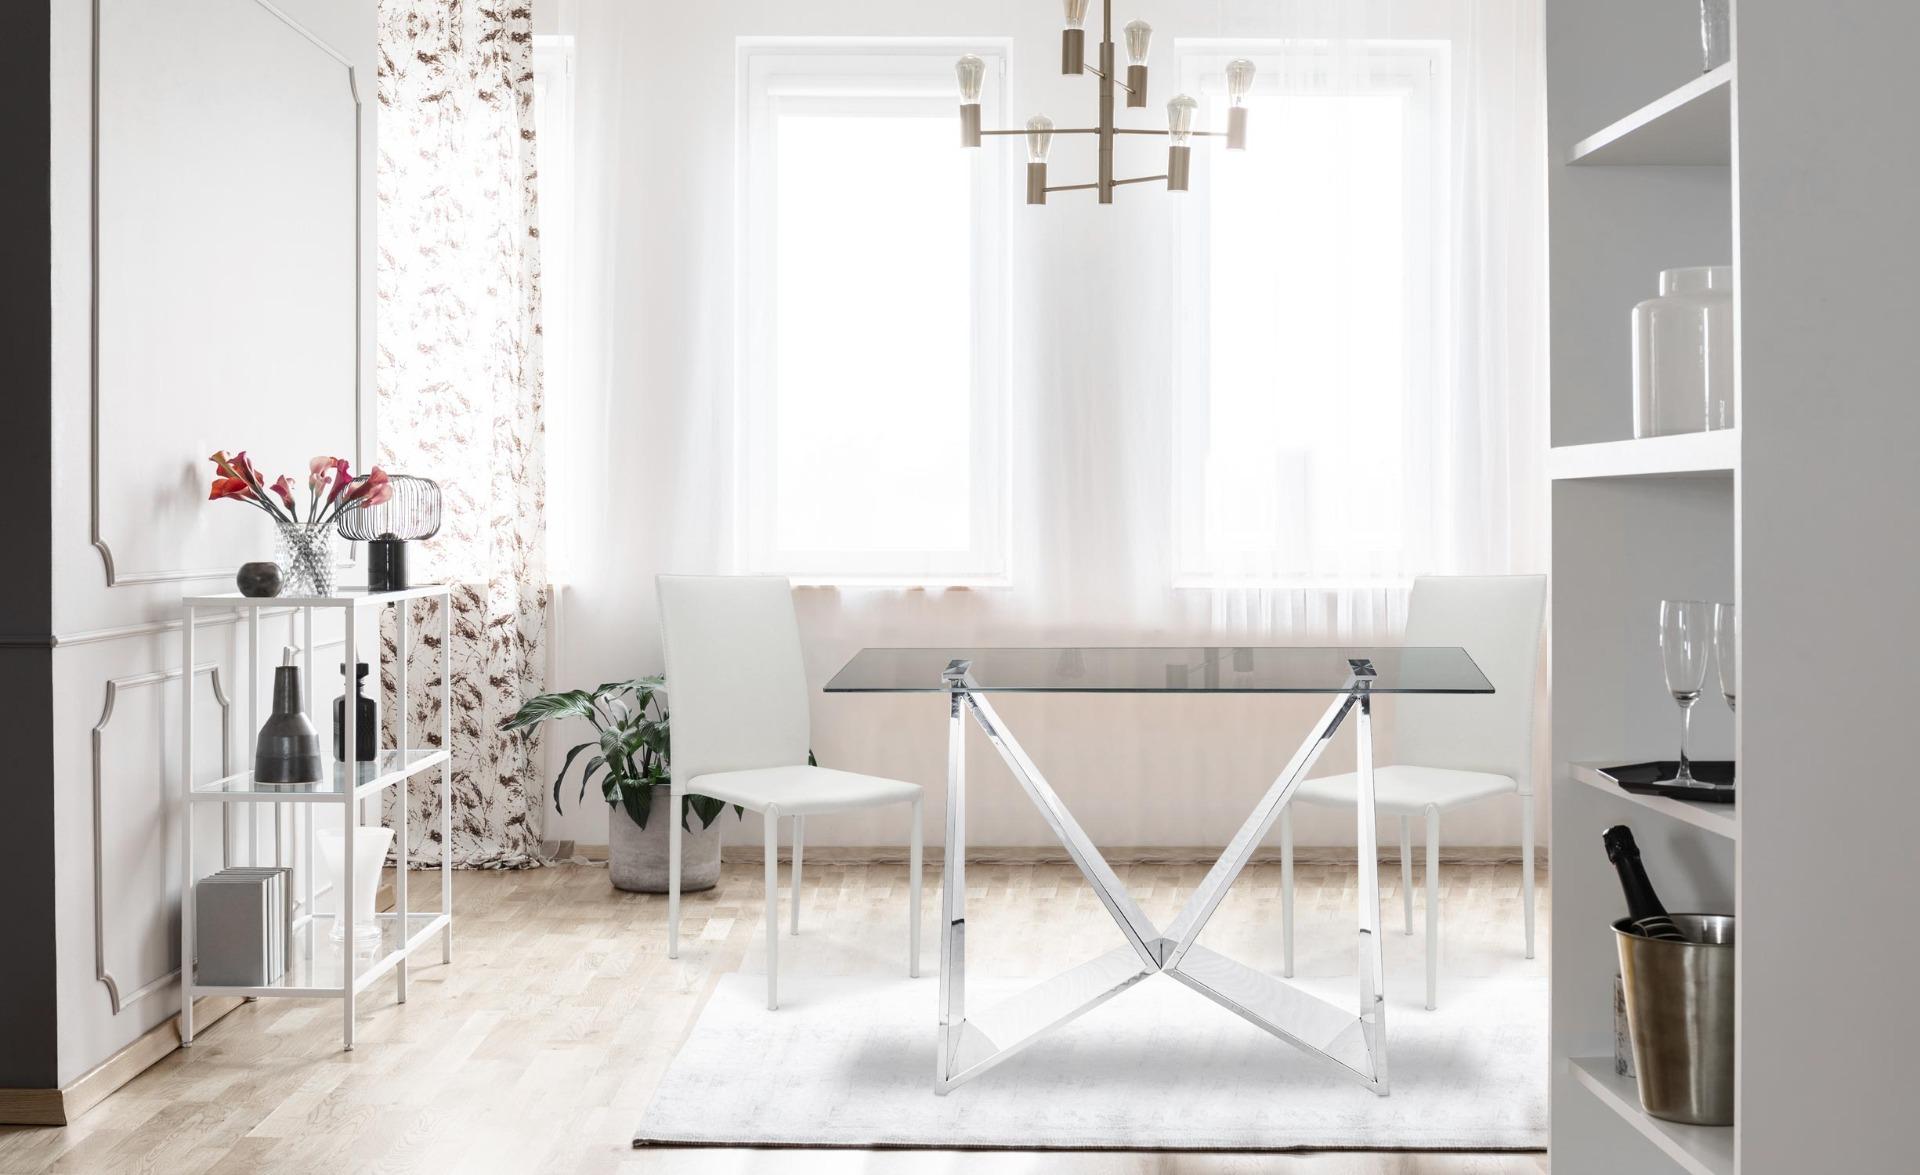 Set di 6 sedie impilabili Modan in similpelle (PU) bianche